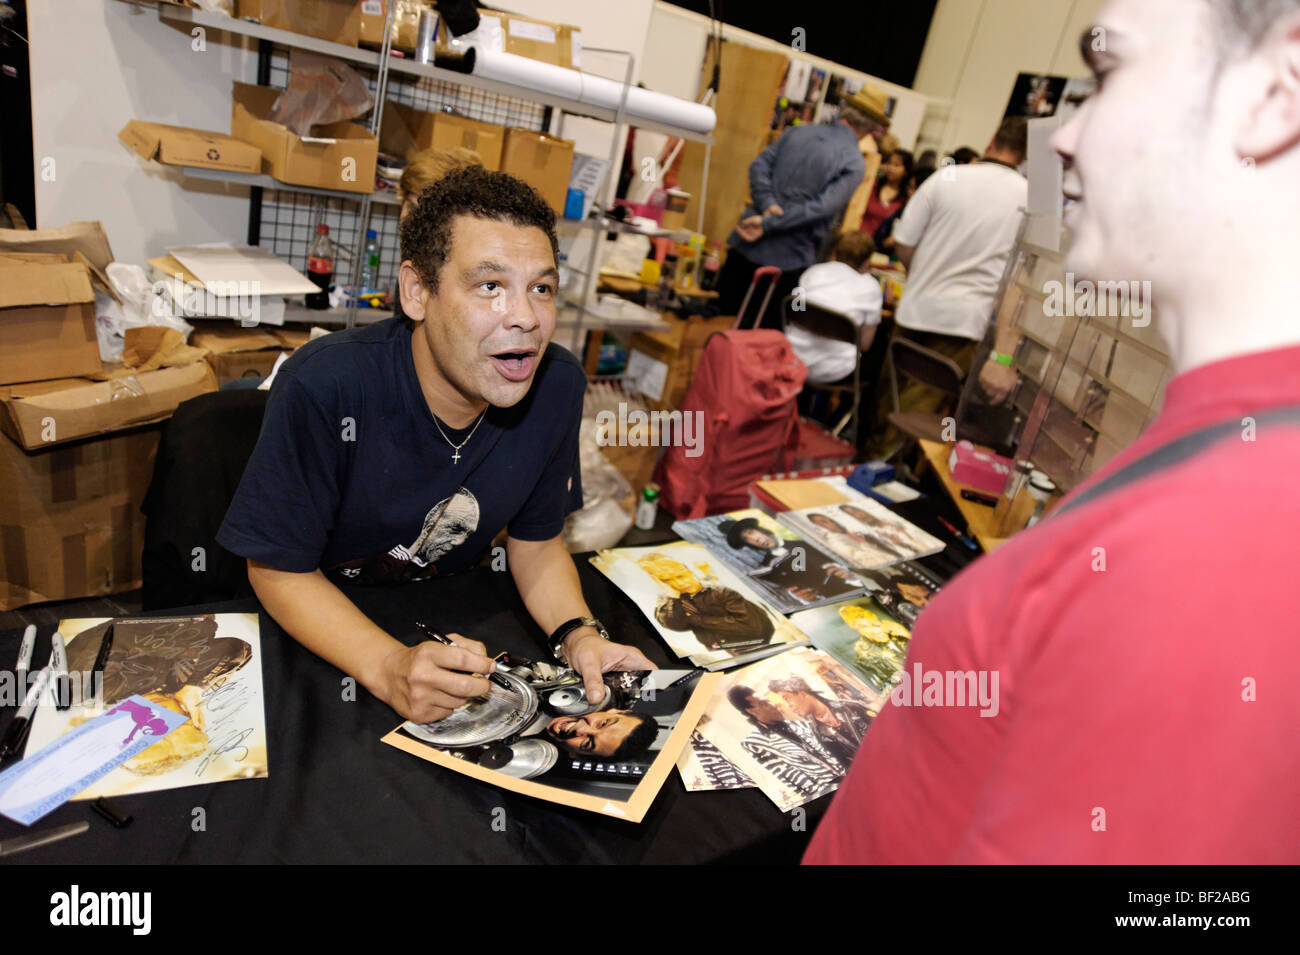 Craig Charles signing autographs at the London MCM expo. Britain 2009. - Stock Image